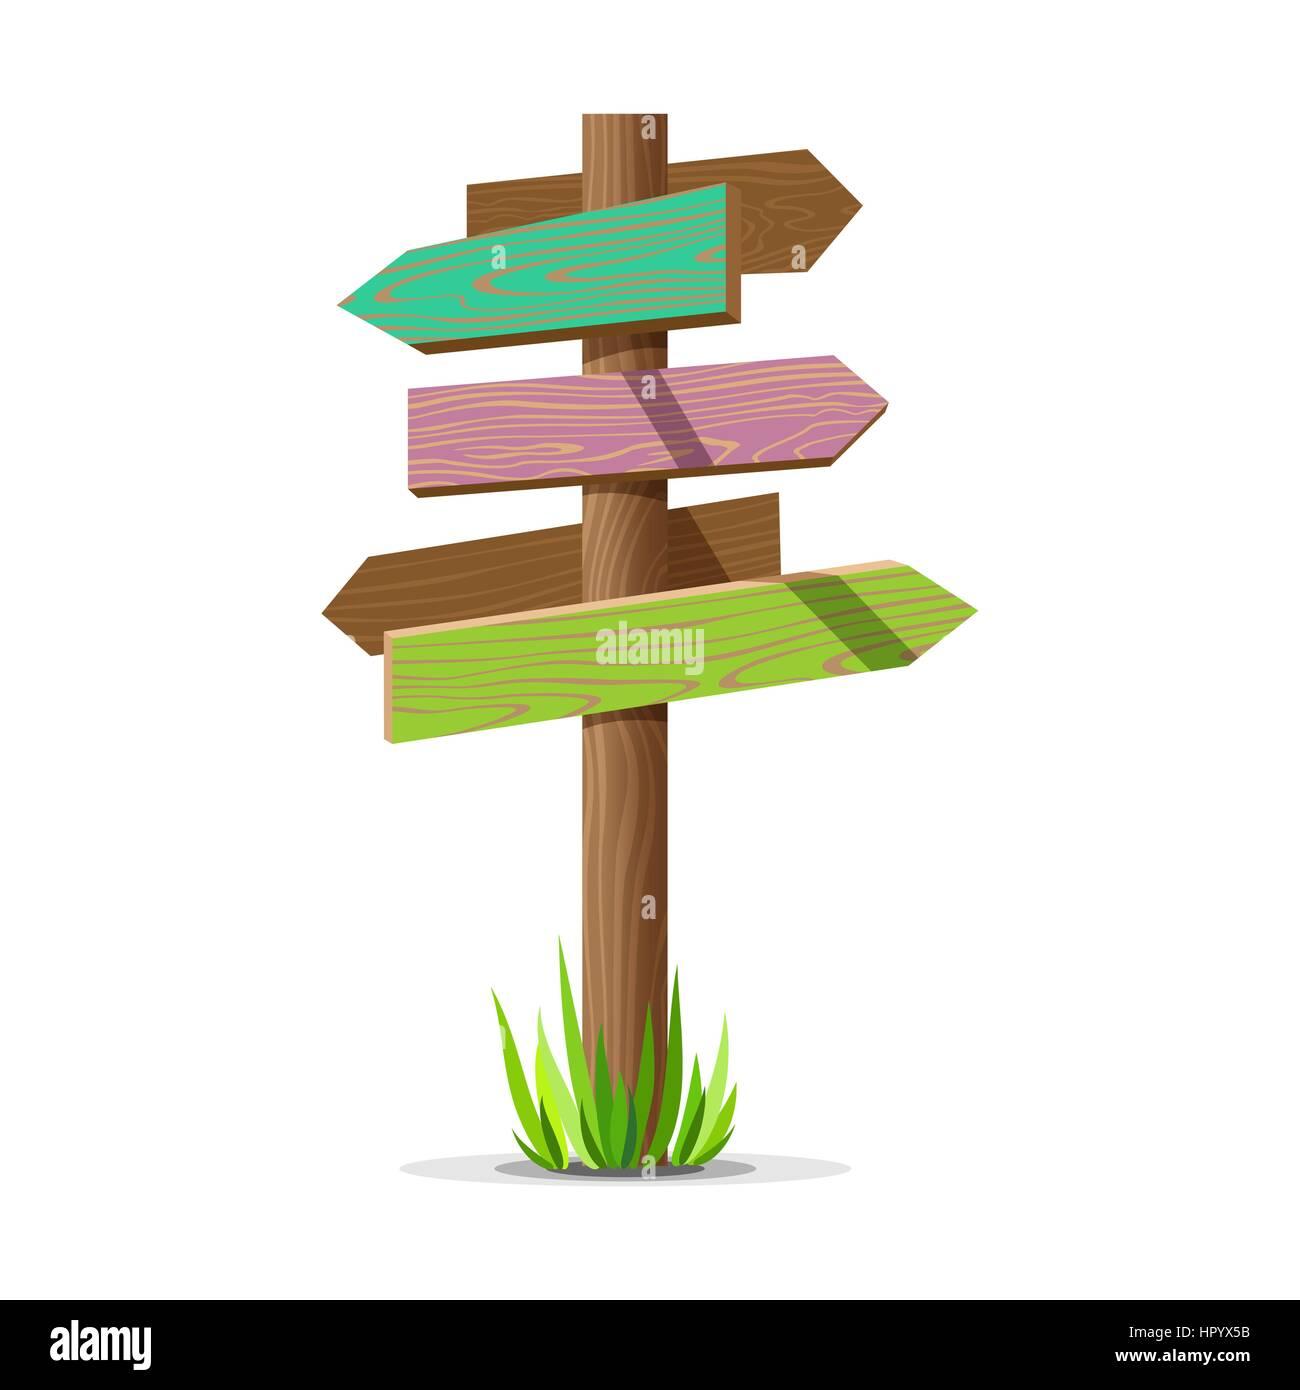 Colored wooden arrow empty vector signboard - Stock Image